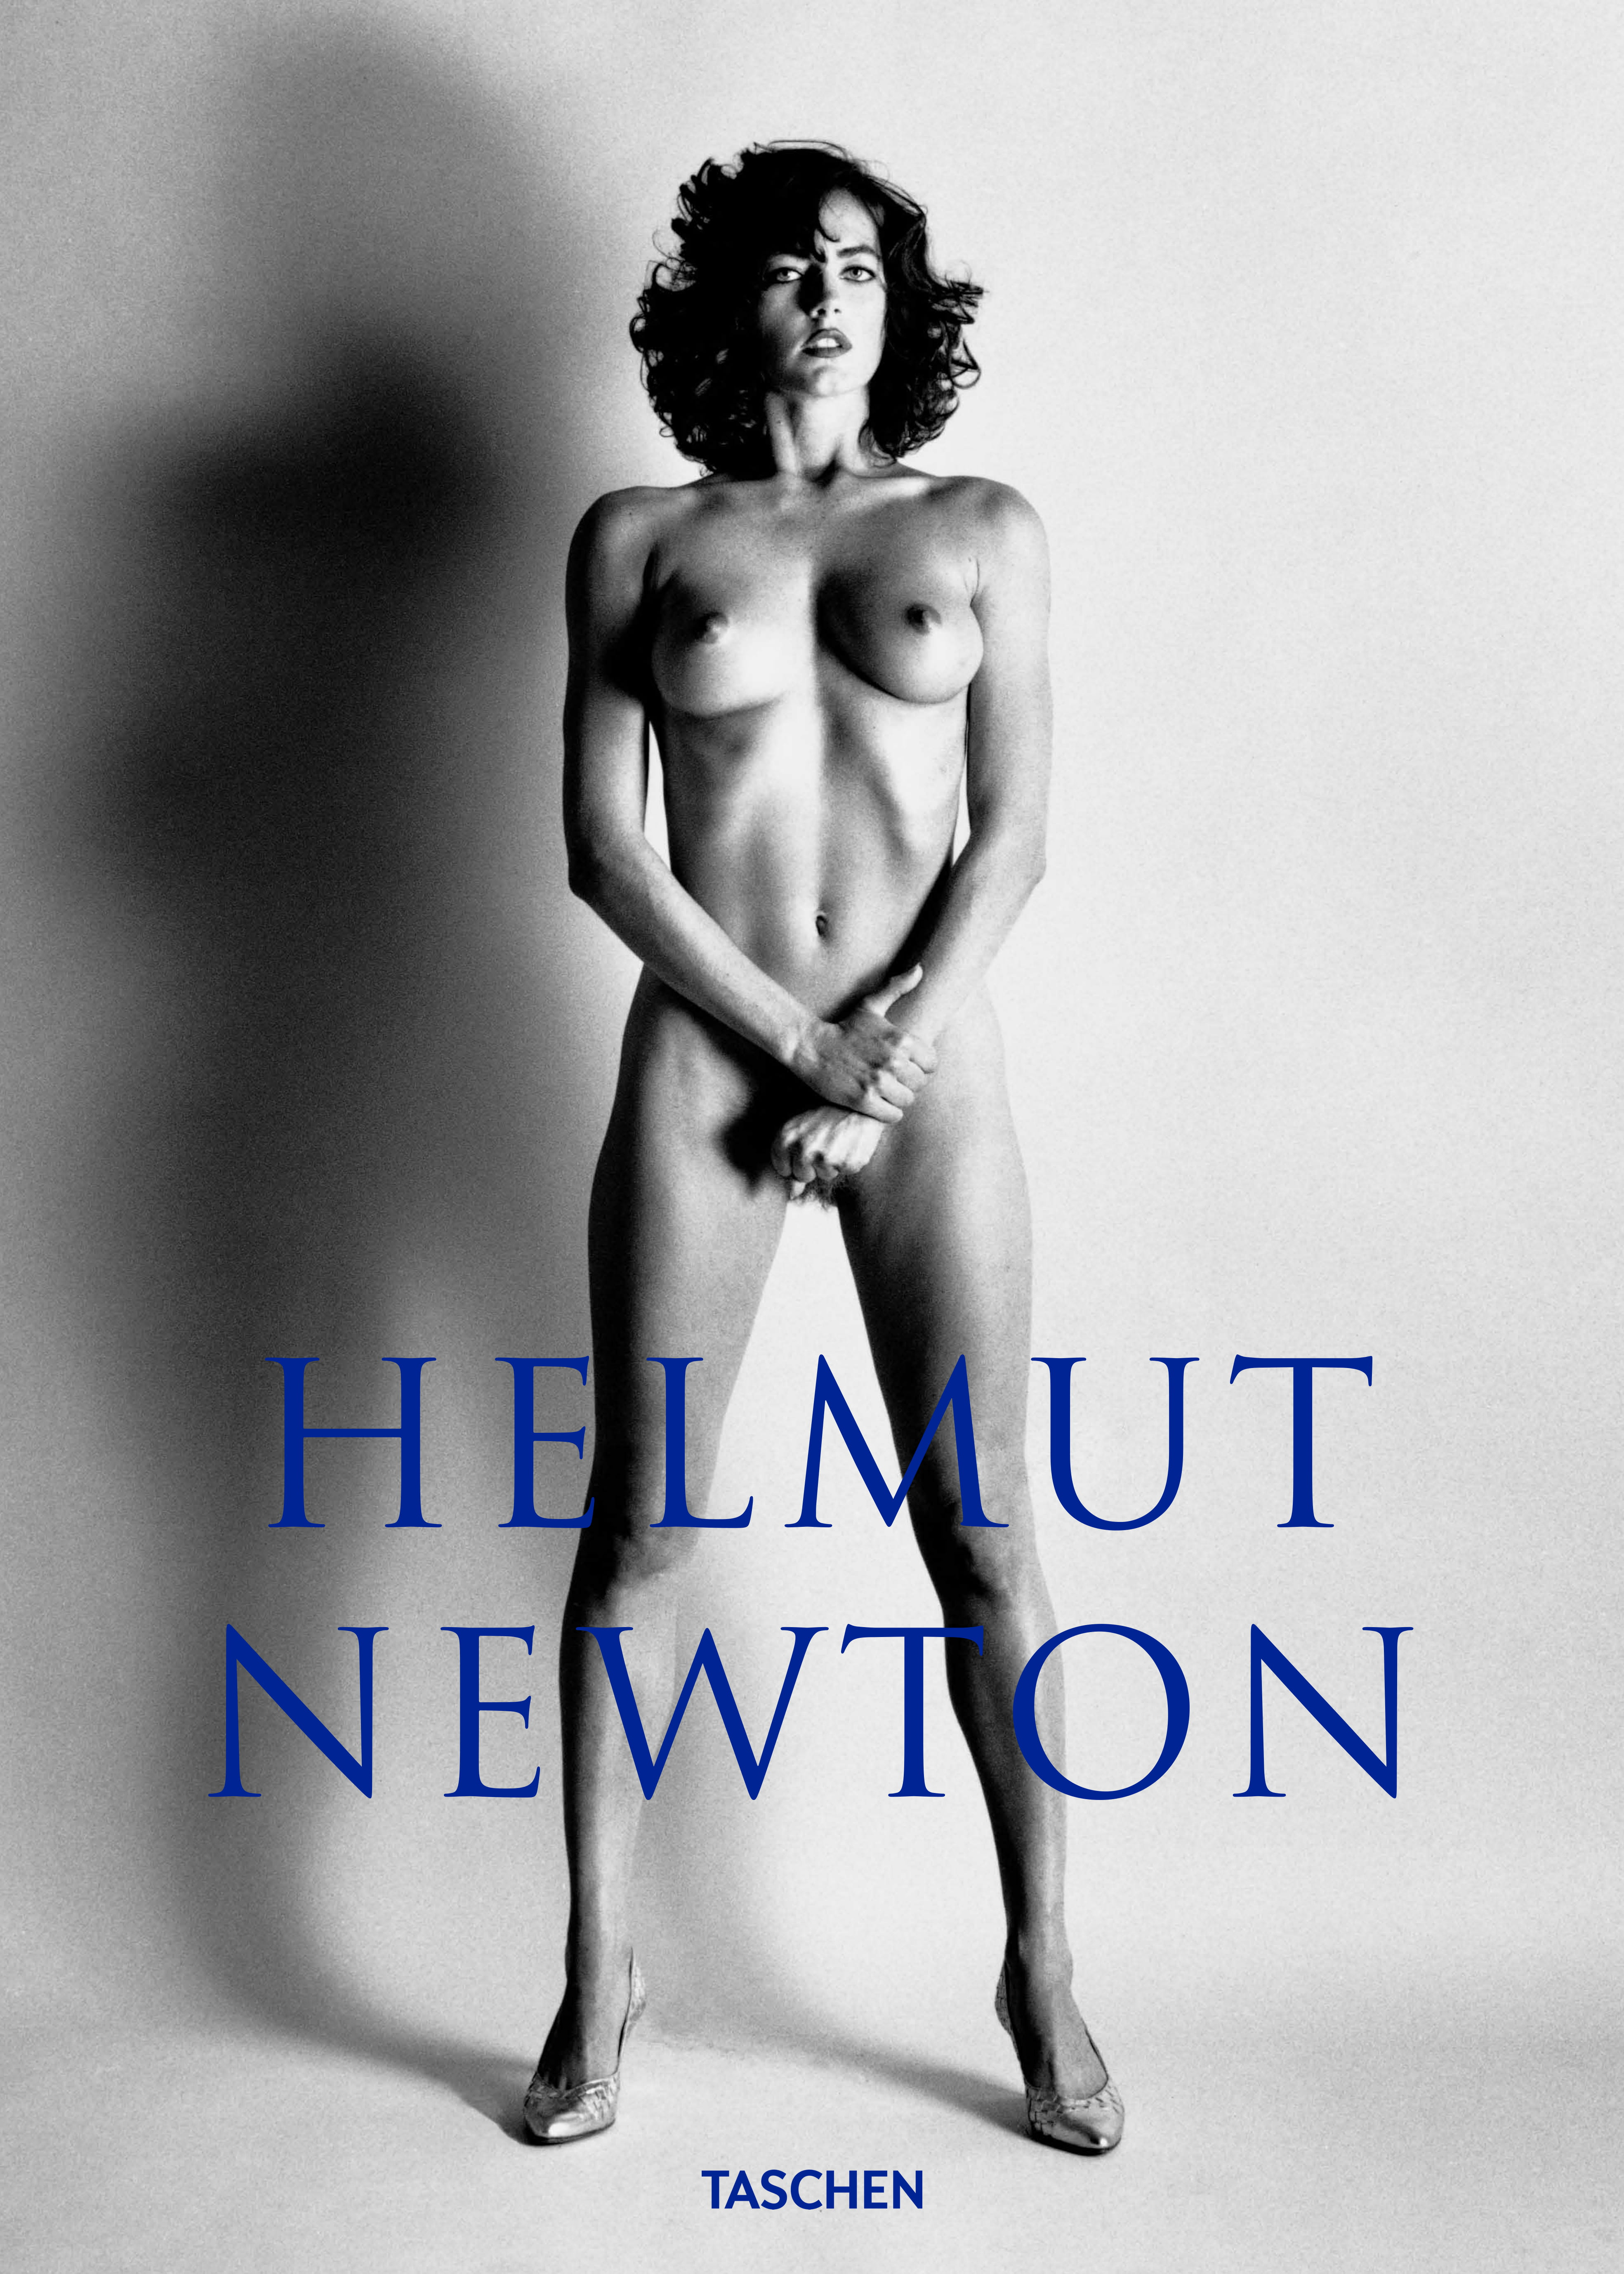 xl_newton_sumo_booklet_00392-01.jpg